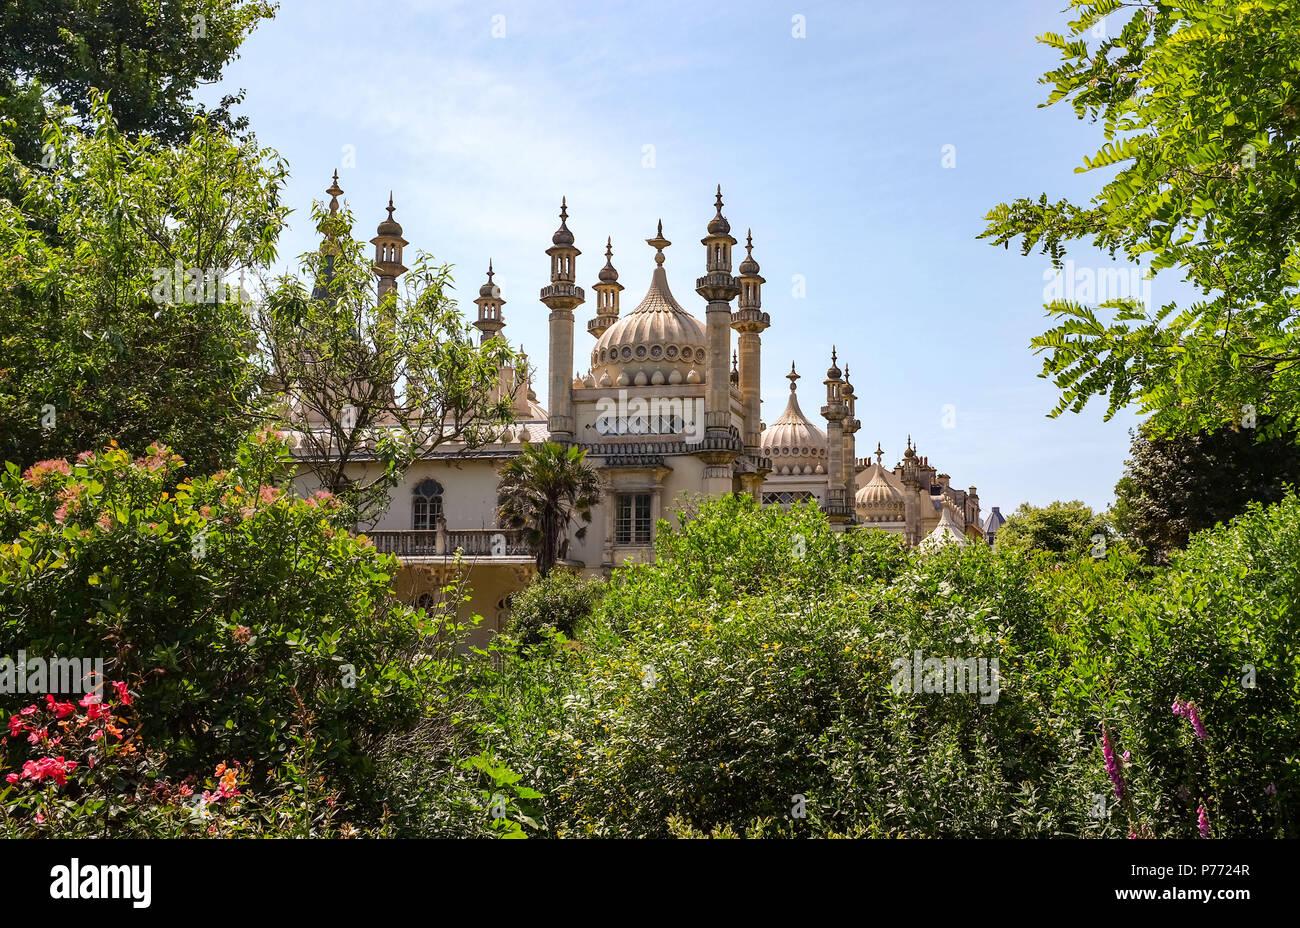 View of The Royal Pavilion Brighton UK Photograph taken by Simon Dack - Stock Image